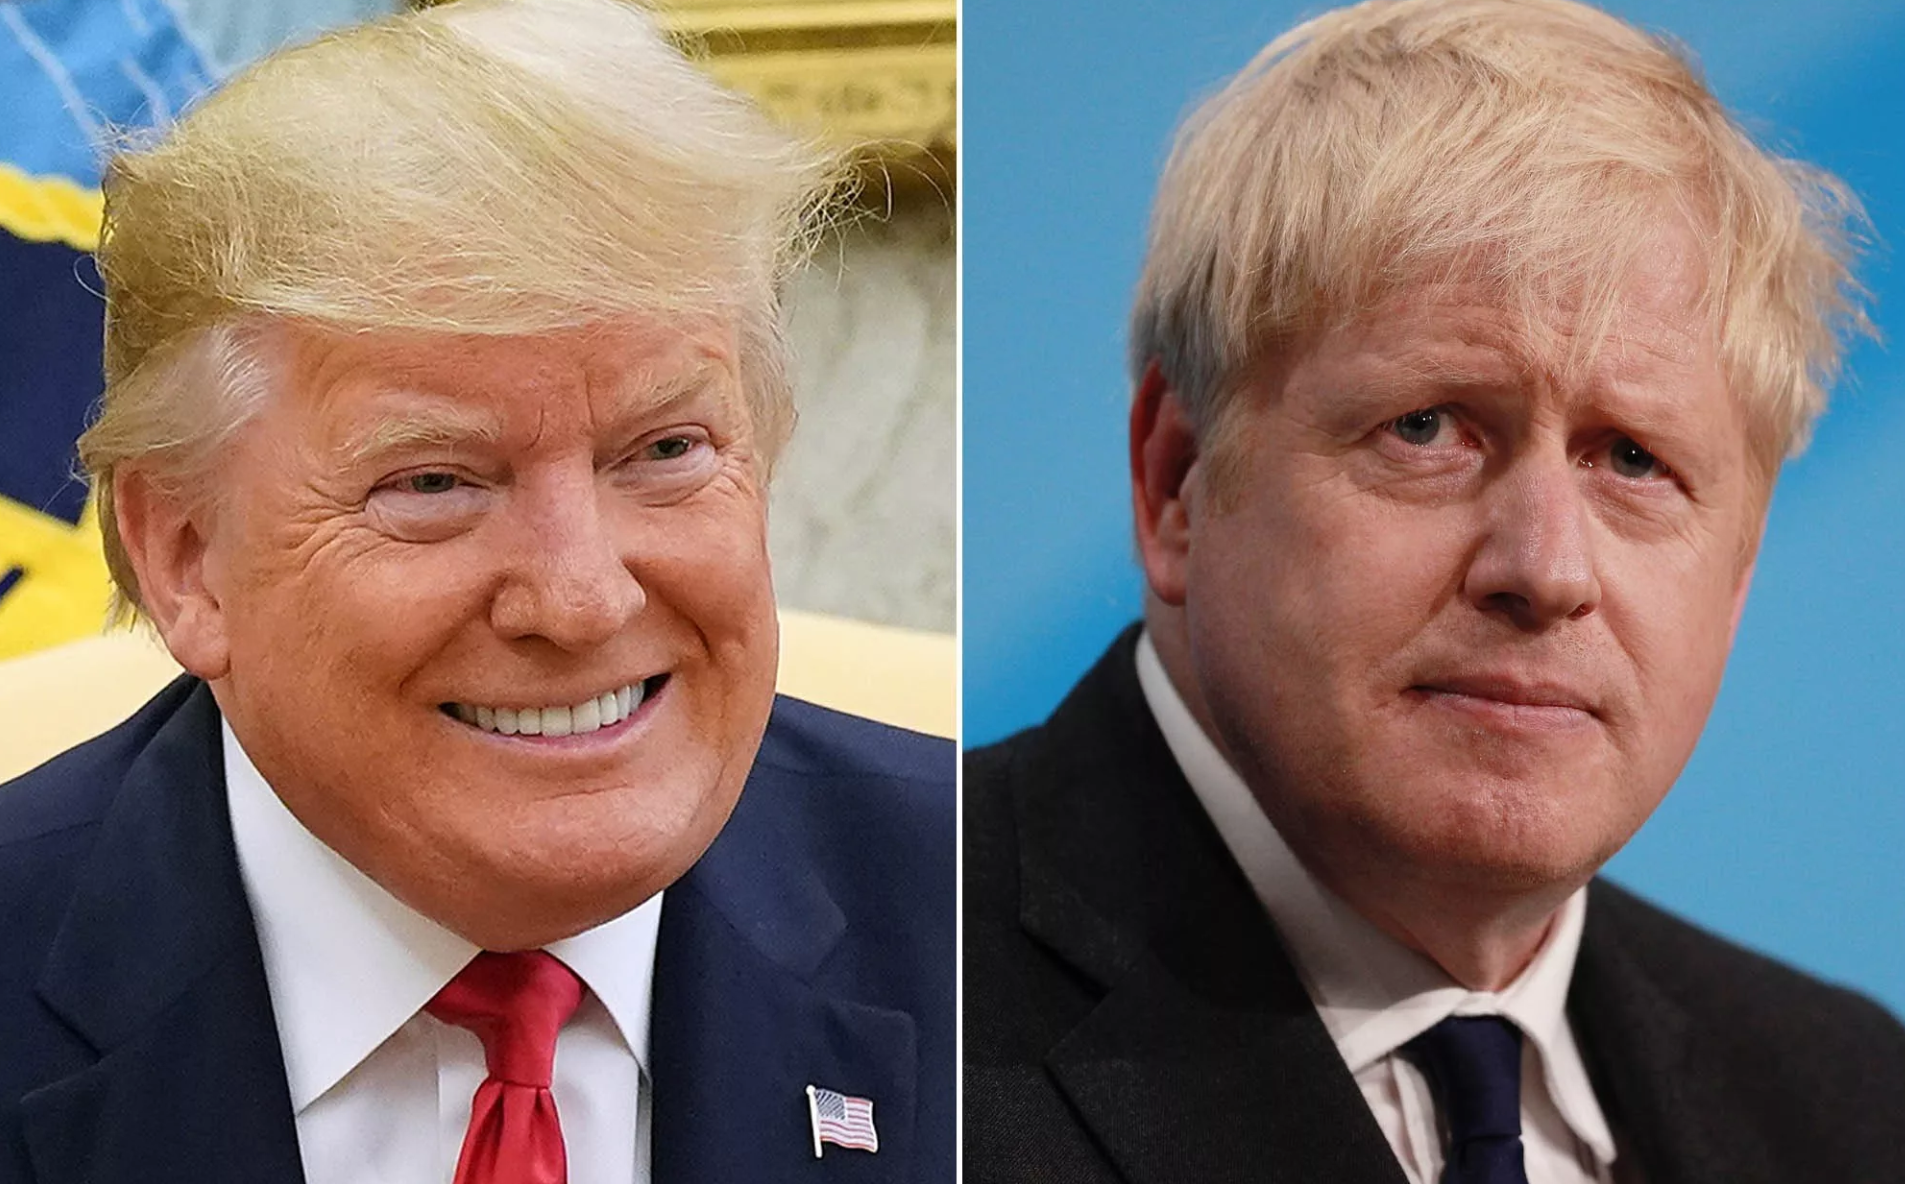 Time vs. Trump, Parliament vs. Johnson